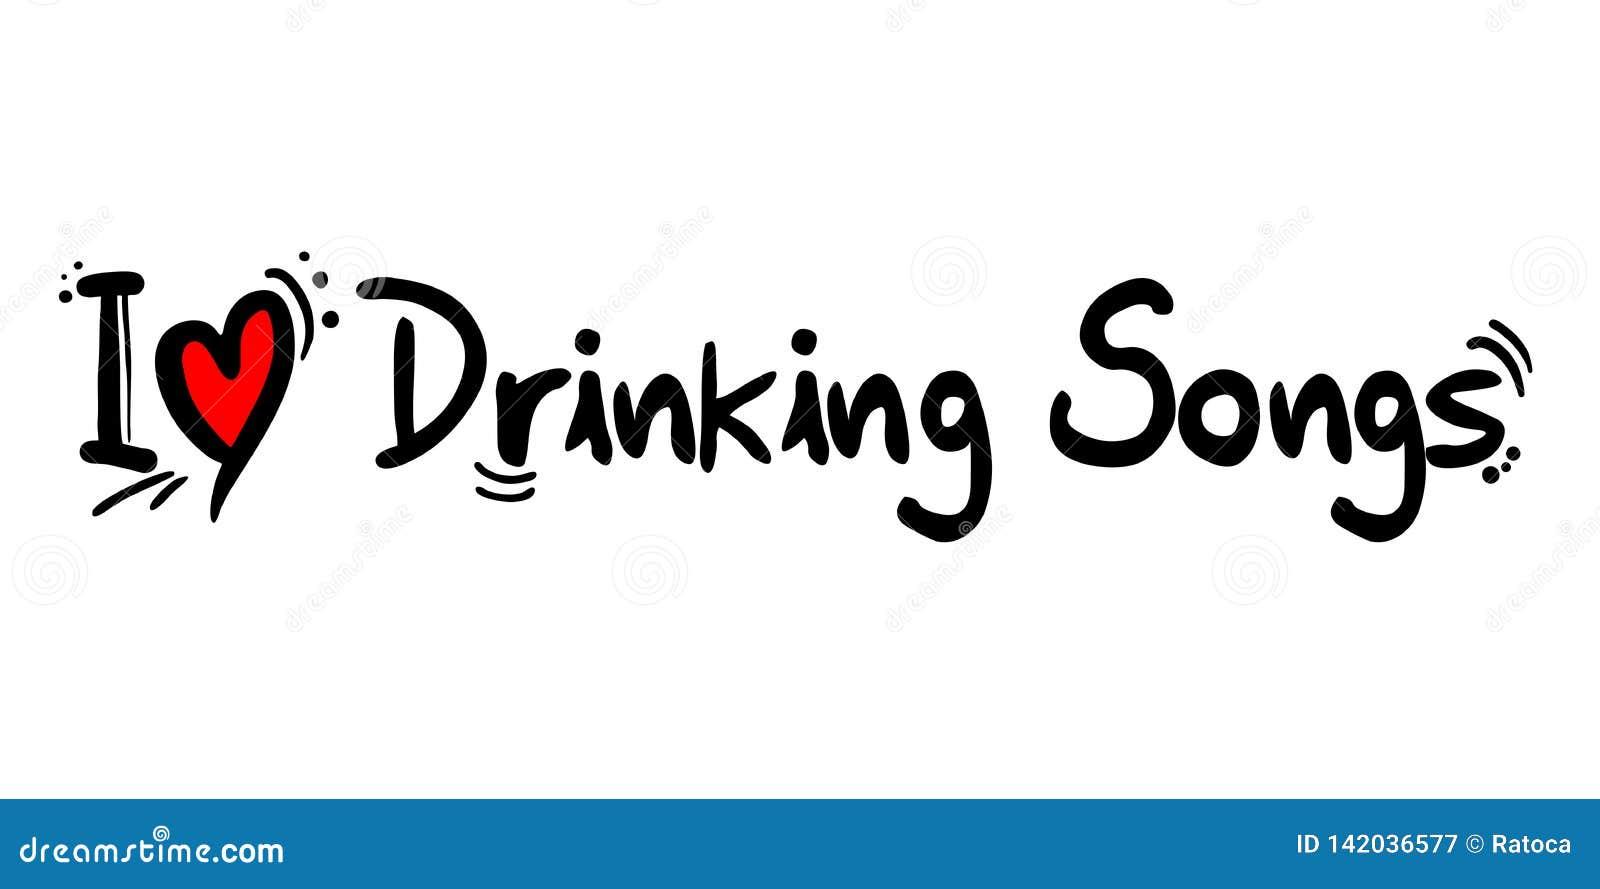 Drinking Songs Stock Illustrations – 6 Drinking Songs Stock